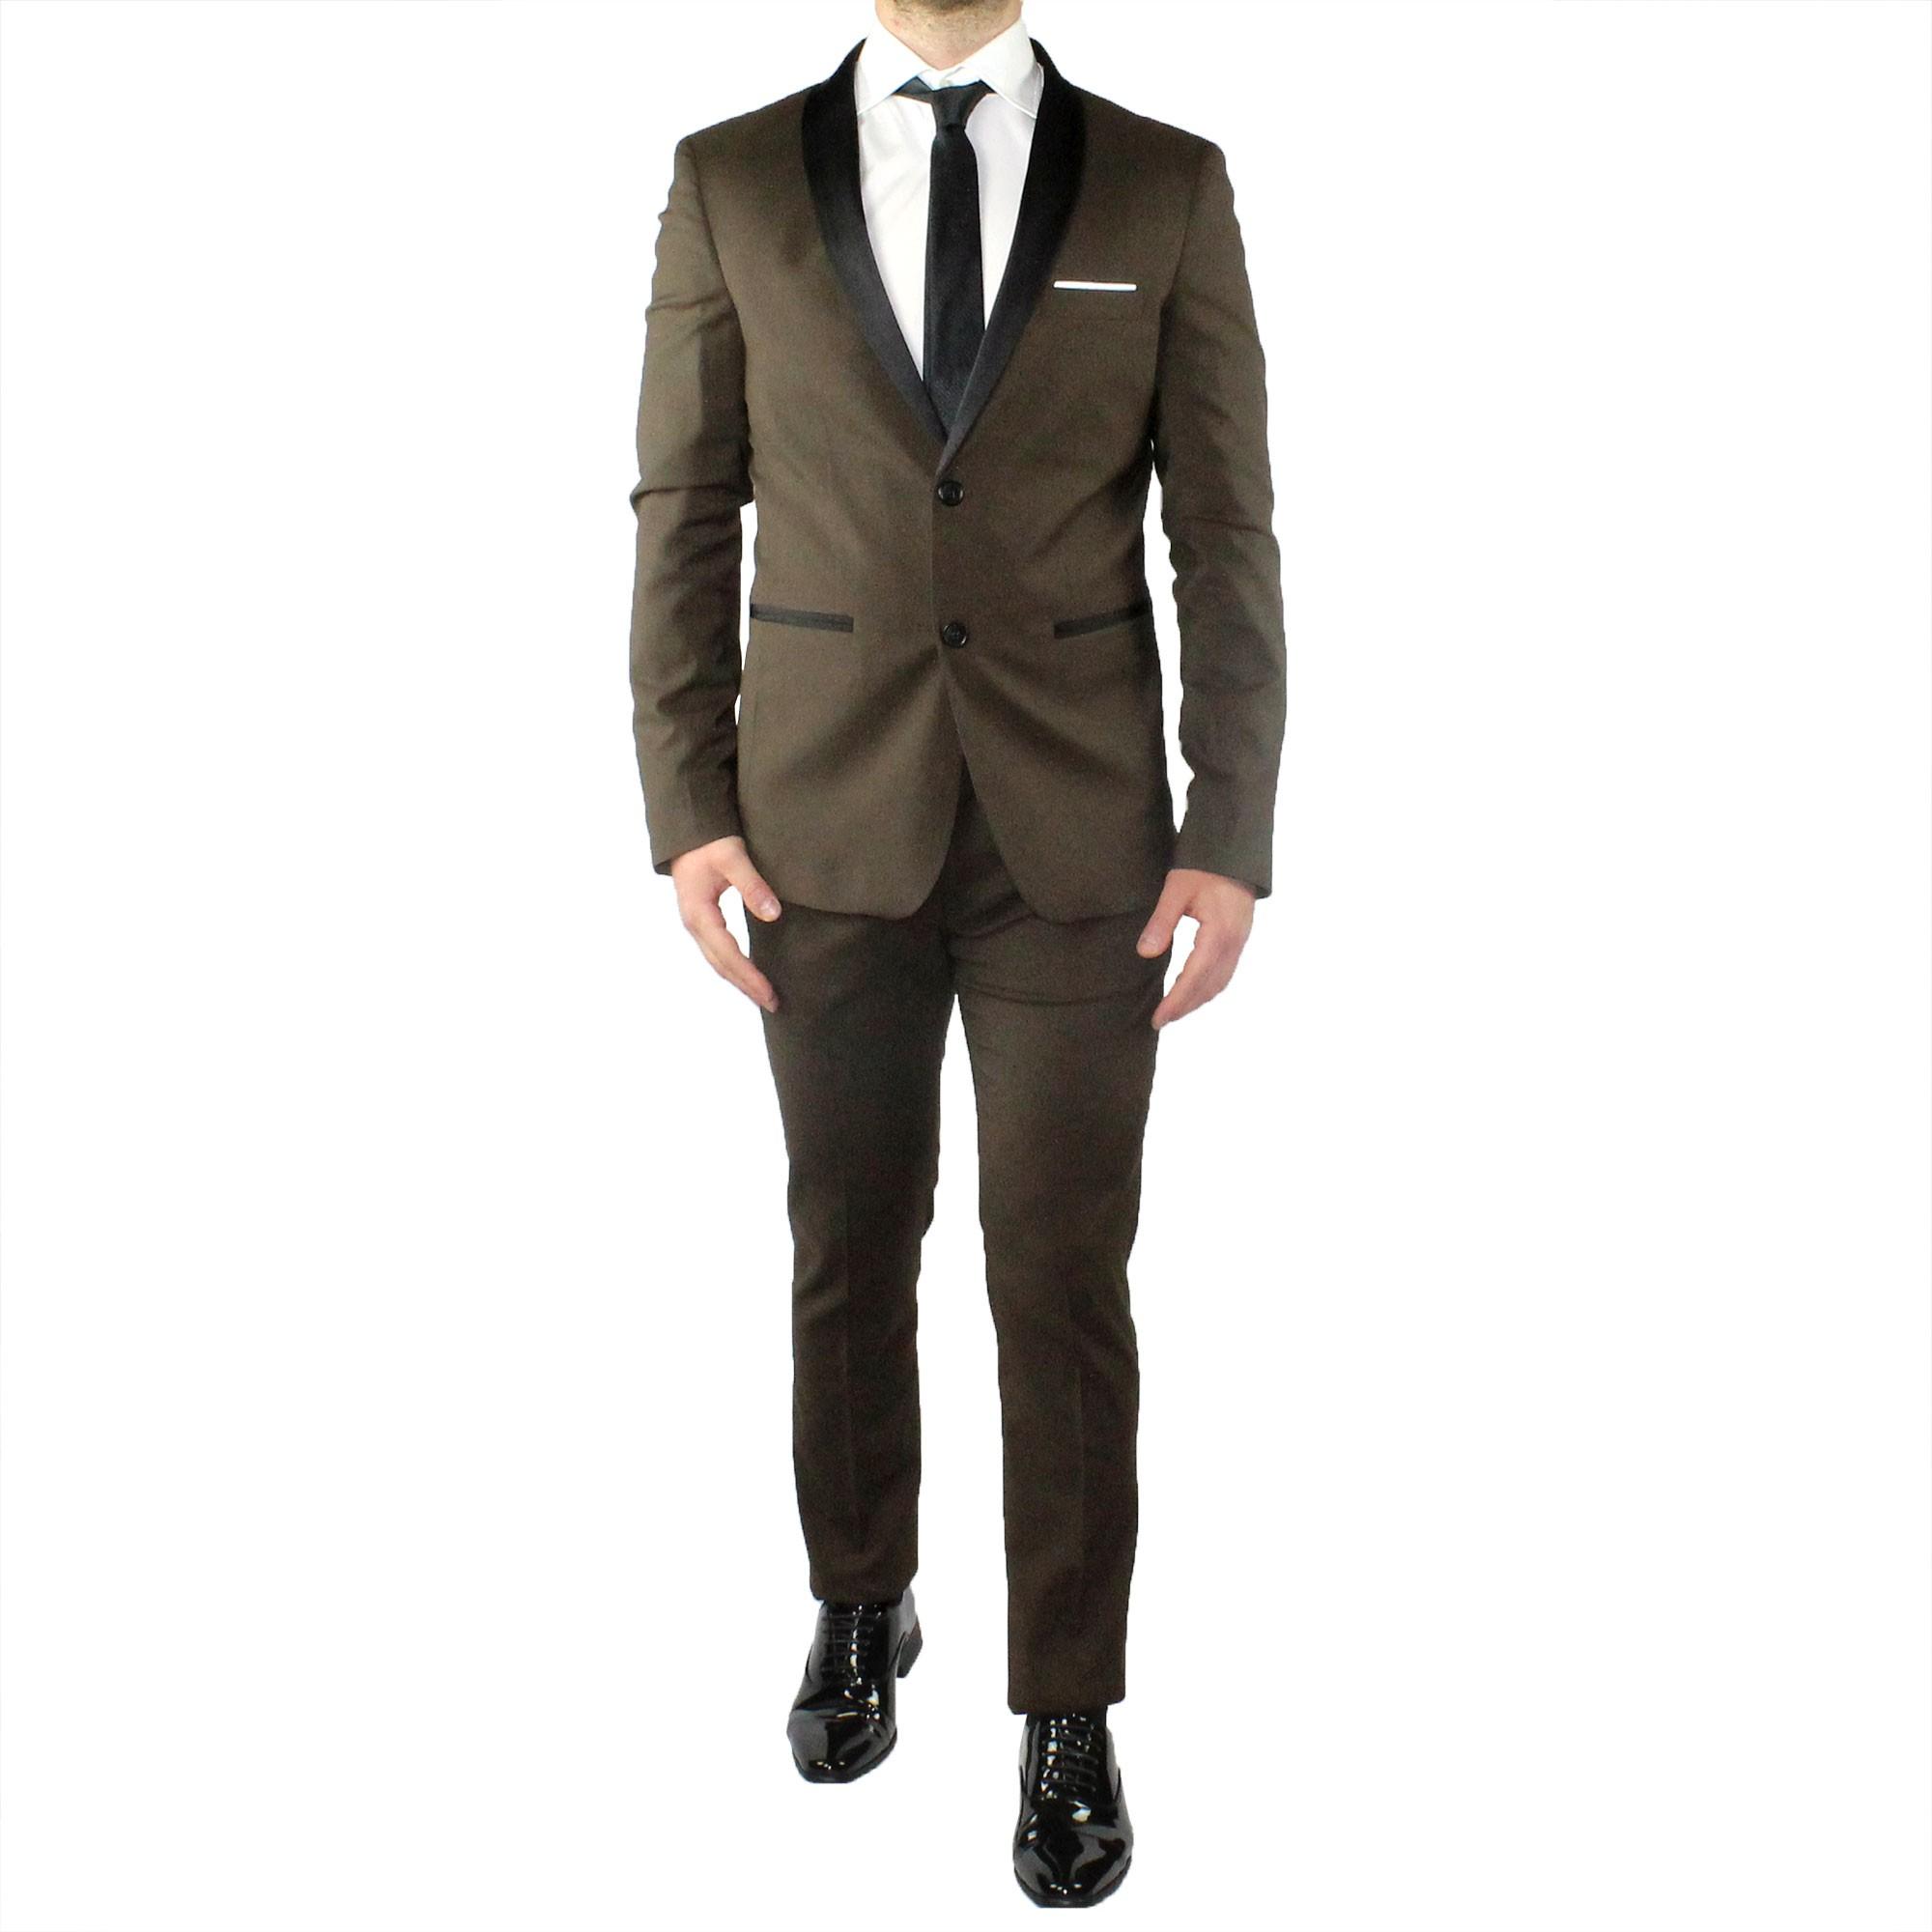 Abito-Uomo-Smoking-Elegante-Vestito-Completo-Estivo-Cerimonia-Sartoriale-Slim miniatura 17